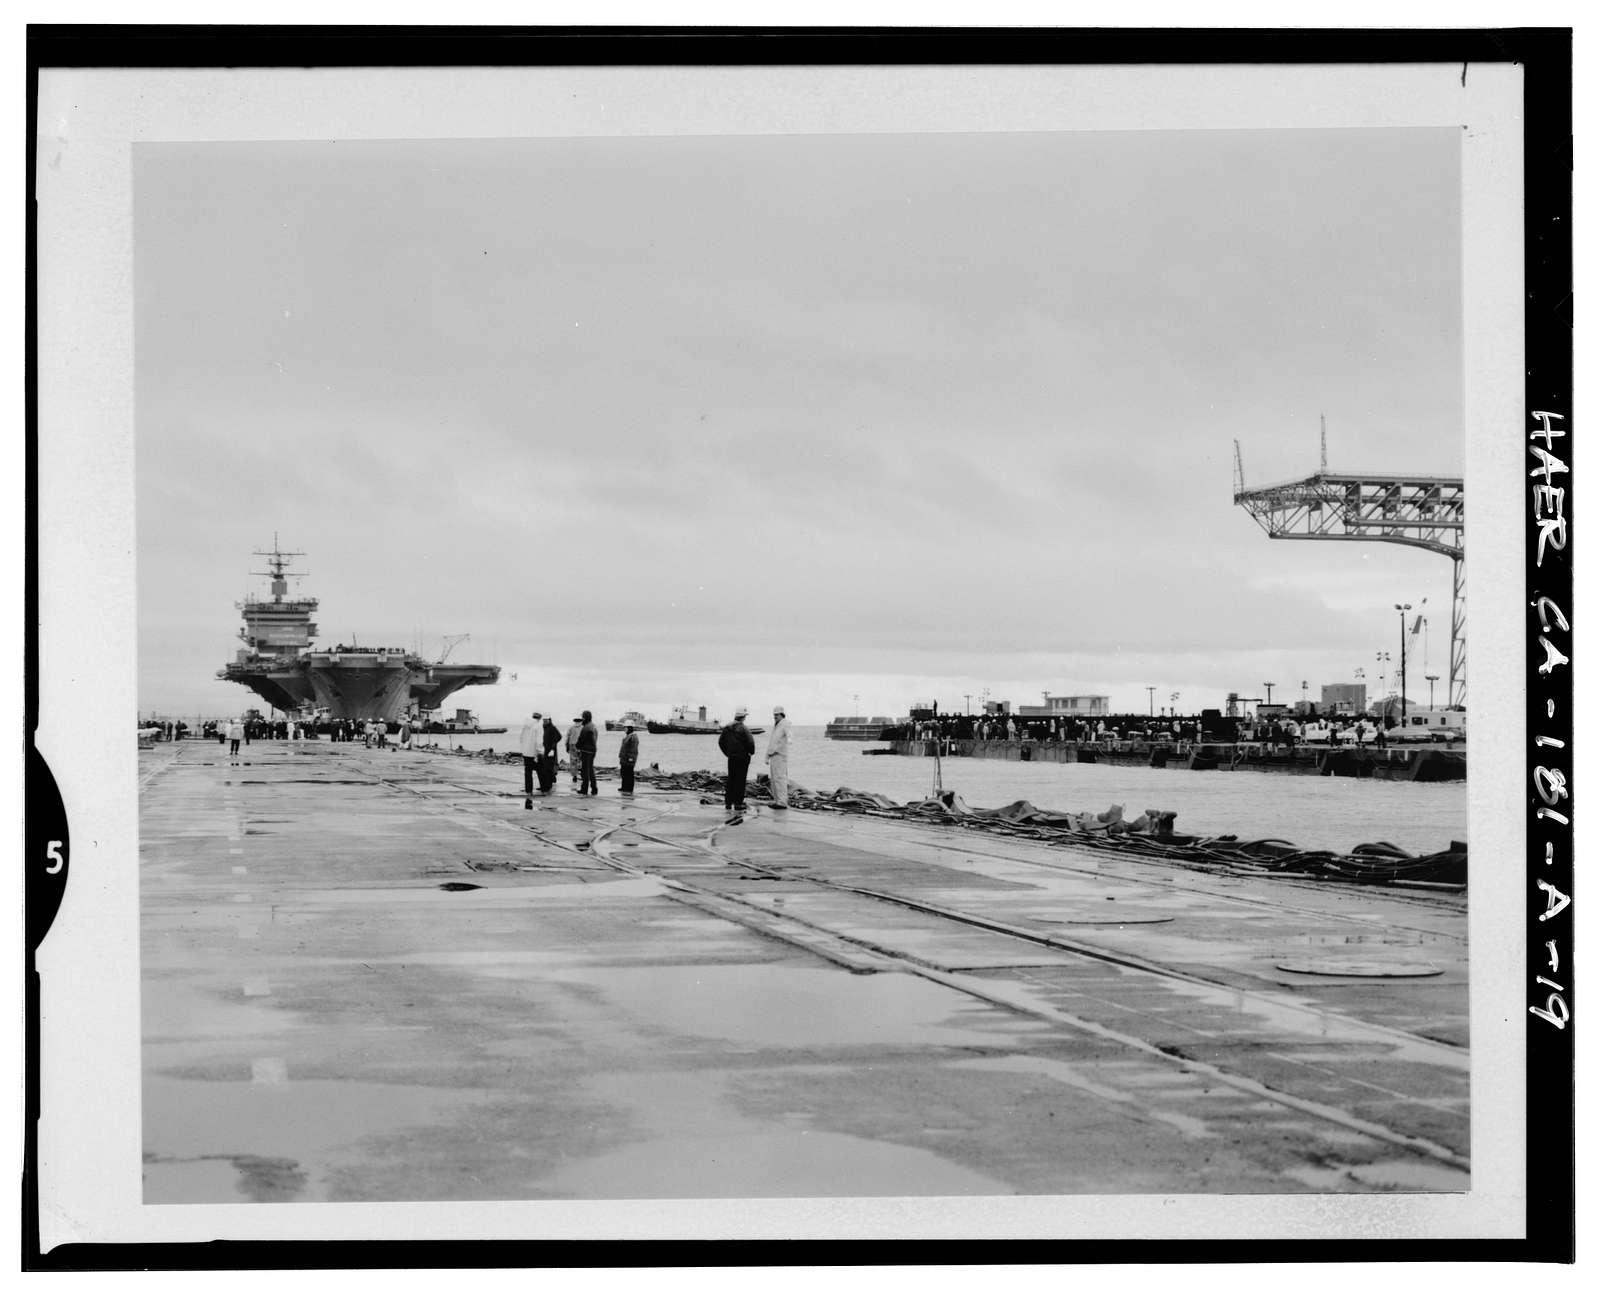 Hunters Point Naval Shipyard, Drydock No. 4, East terminus of Palou Avenue, San Francisco, San Francisco County, CA